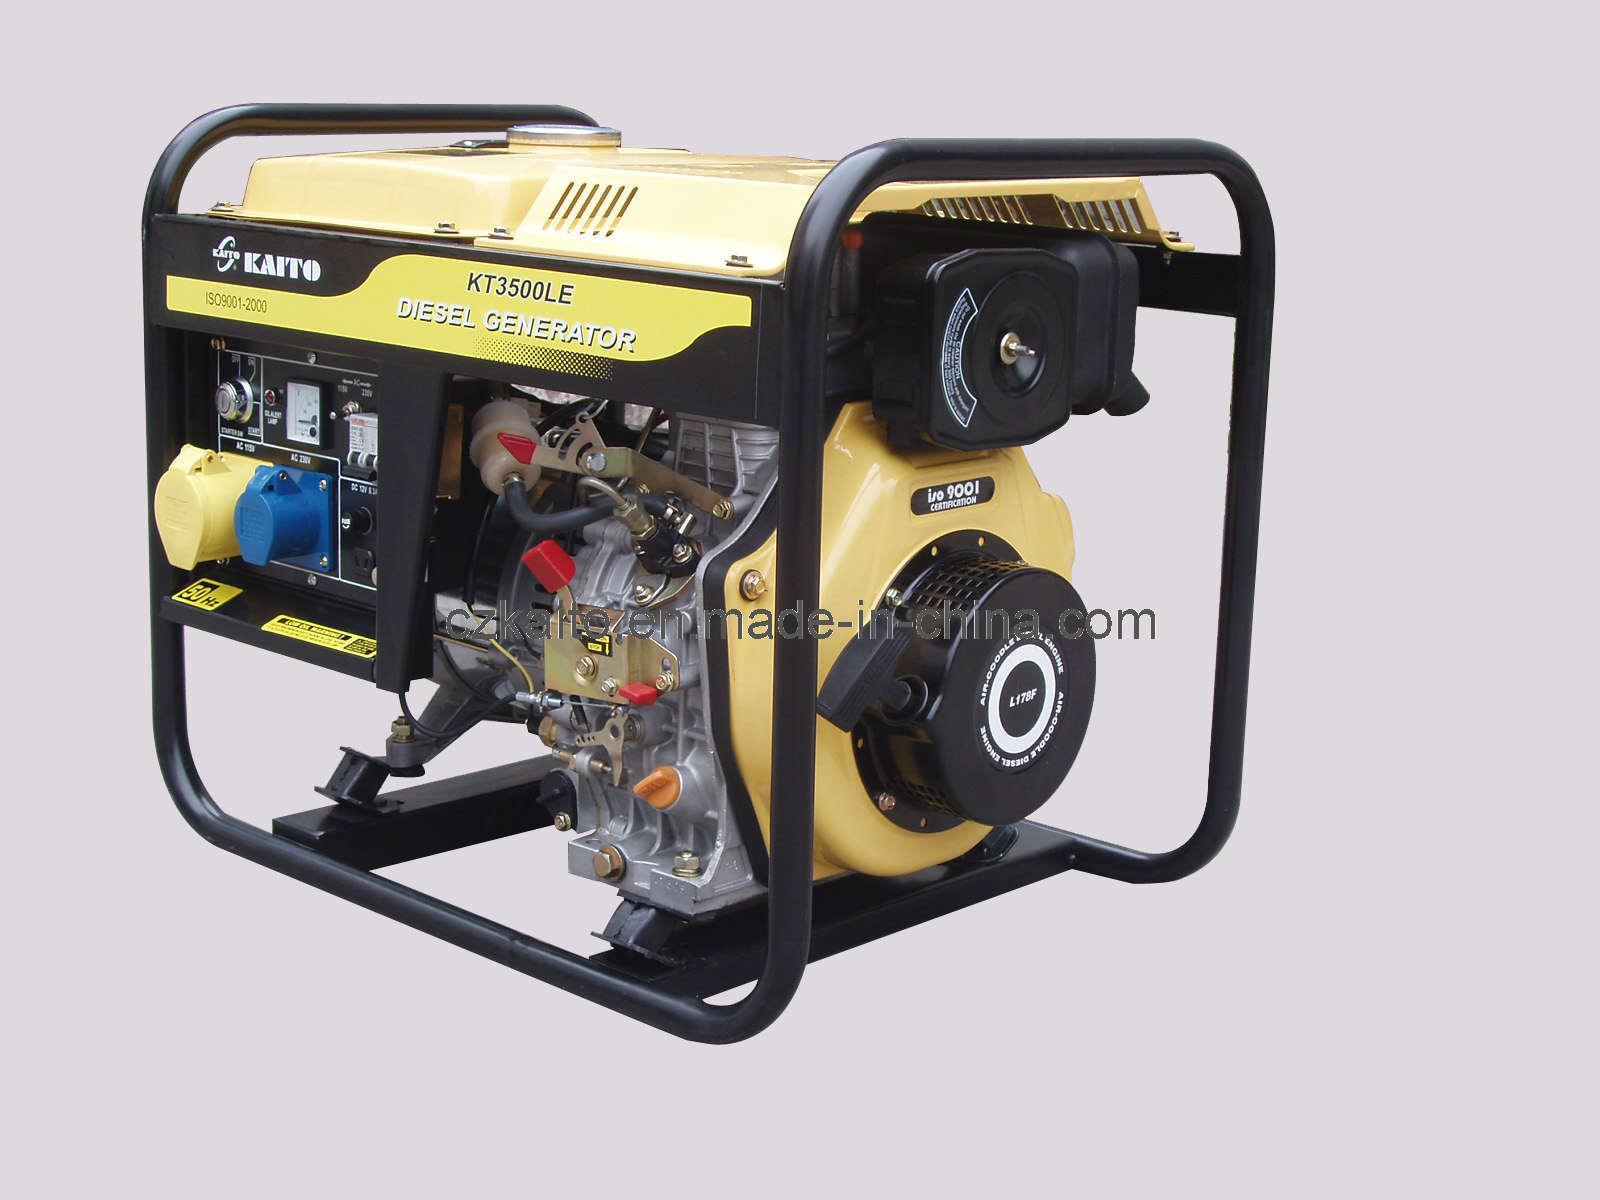 China 3kw Diesel Generator KT3500LE China Air Cooled Diesel